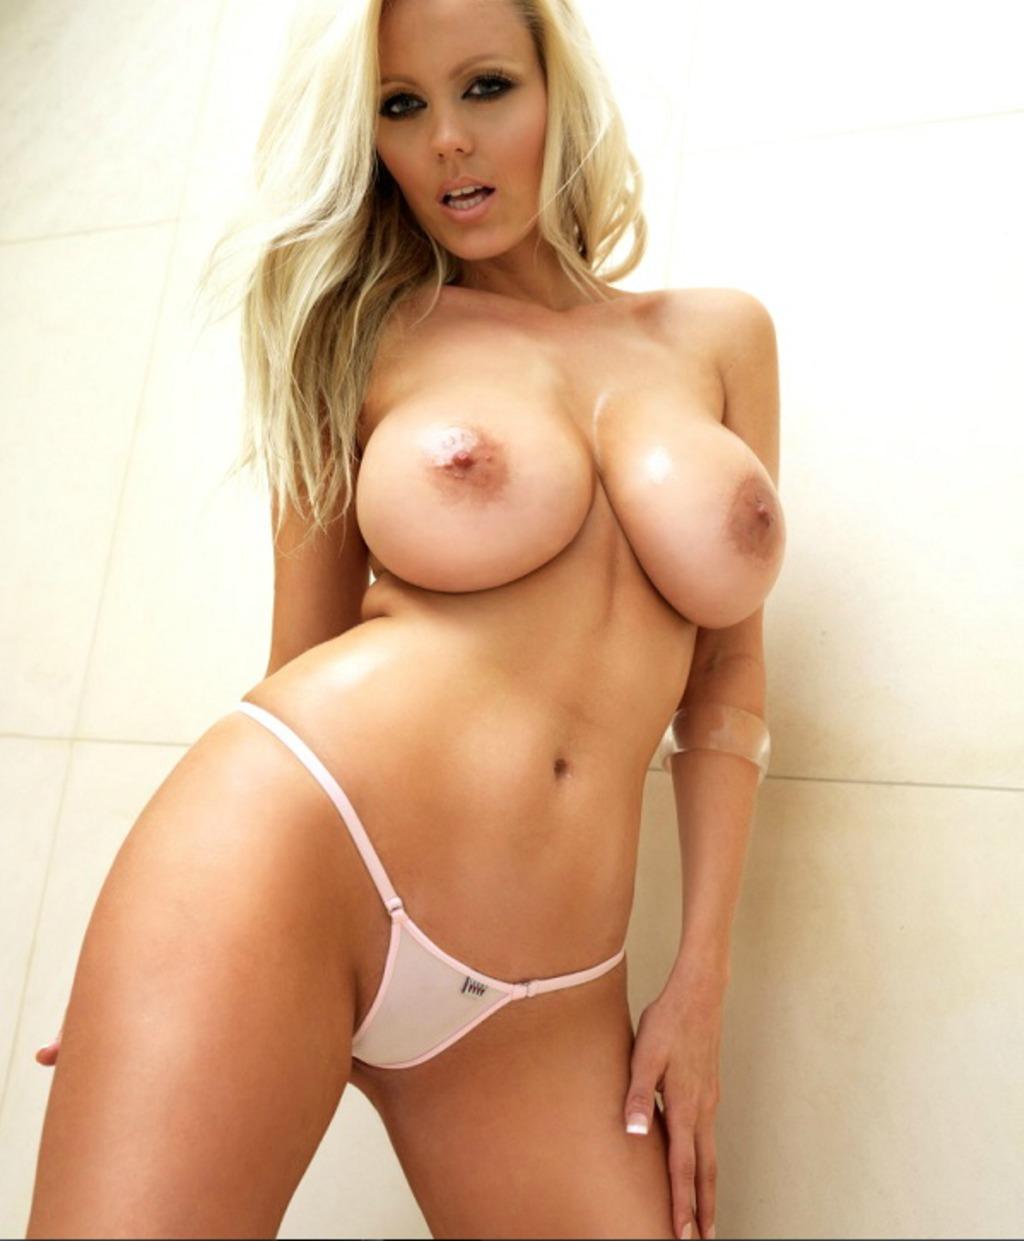 Blonde Glamour Model Big Boobs